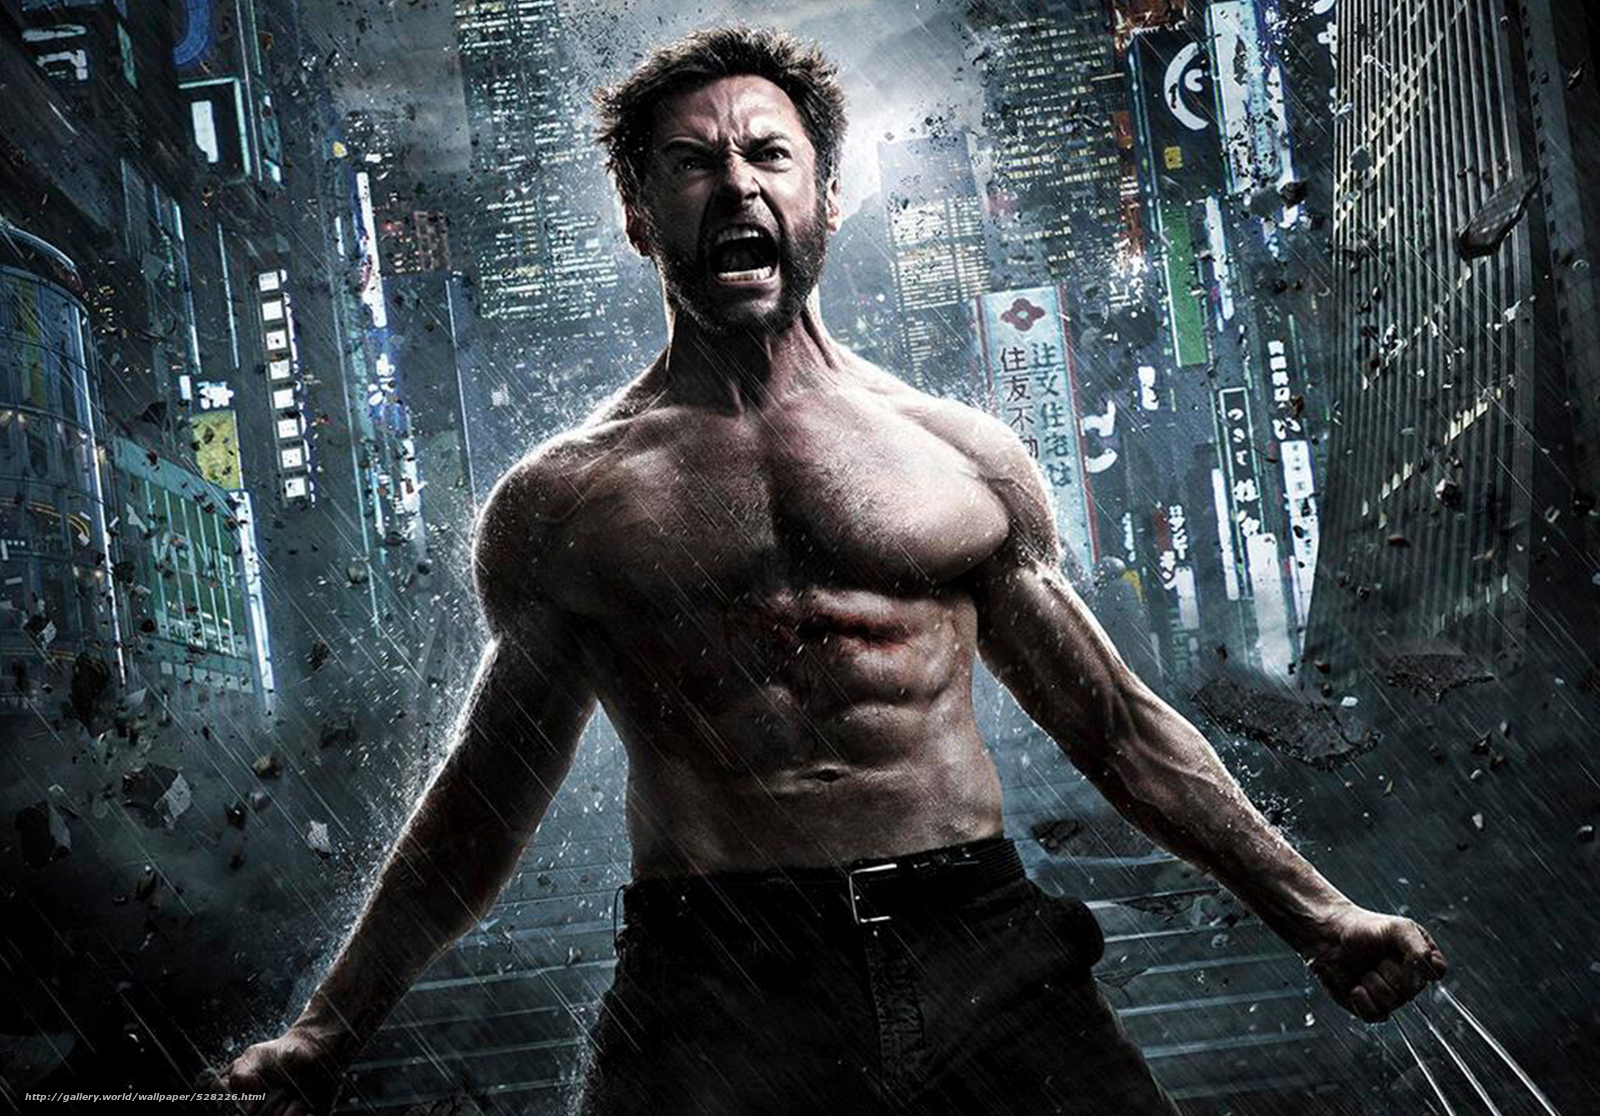 Wolverine: The Immortal, the wolverine, Hugh Jackman, Hugh Jackman, Logan, wolverine